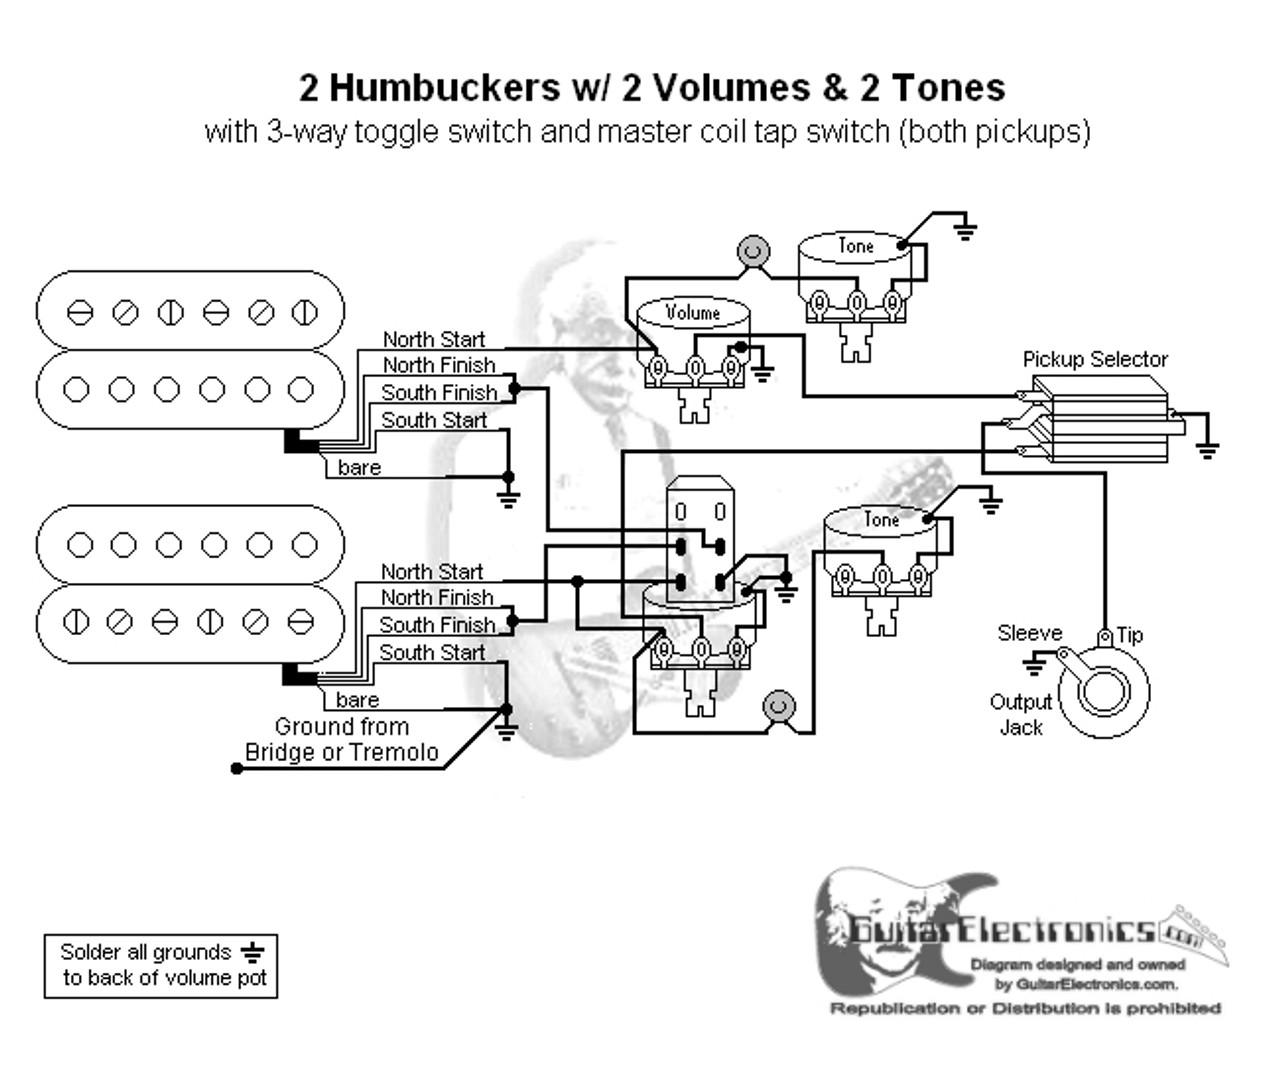 wiring a switchcraft 3 way switch 2 wiring diagram for youswitchcraft wiring diagram 21 [ 1280 x 1083 Pixel ]